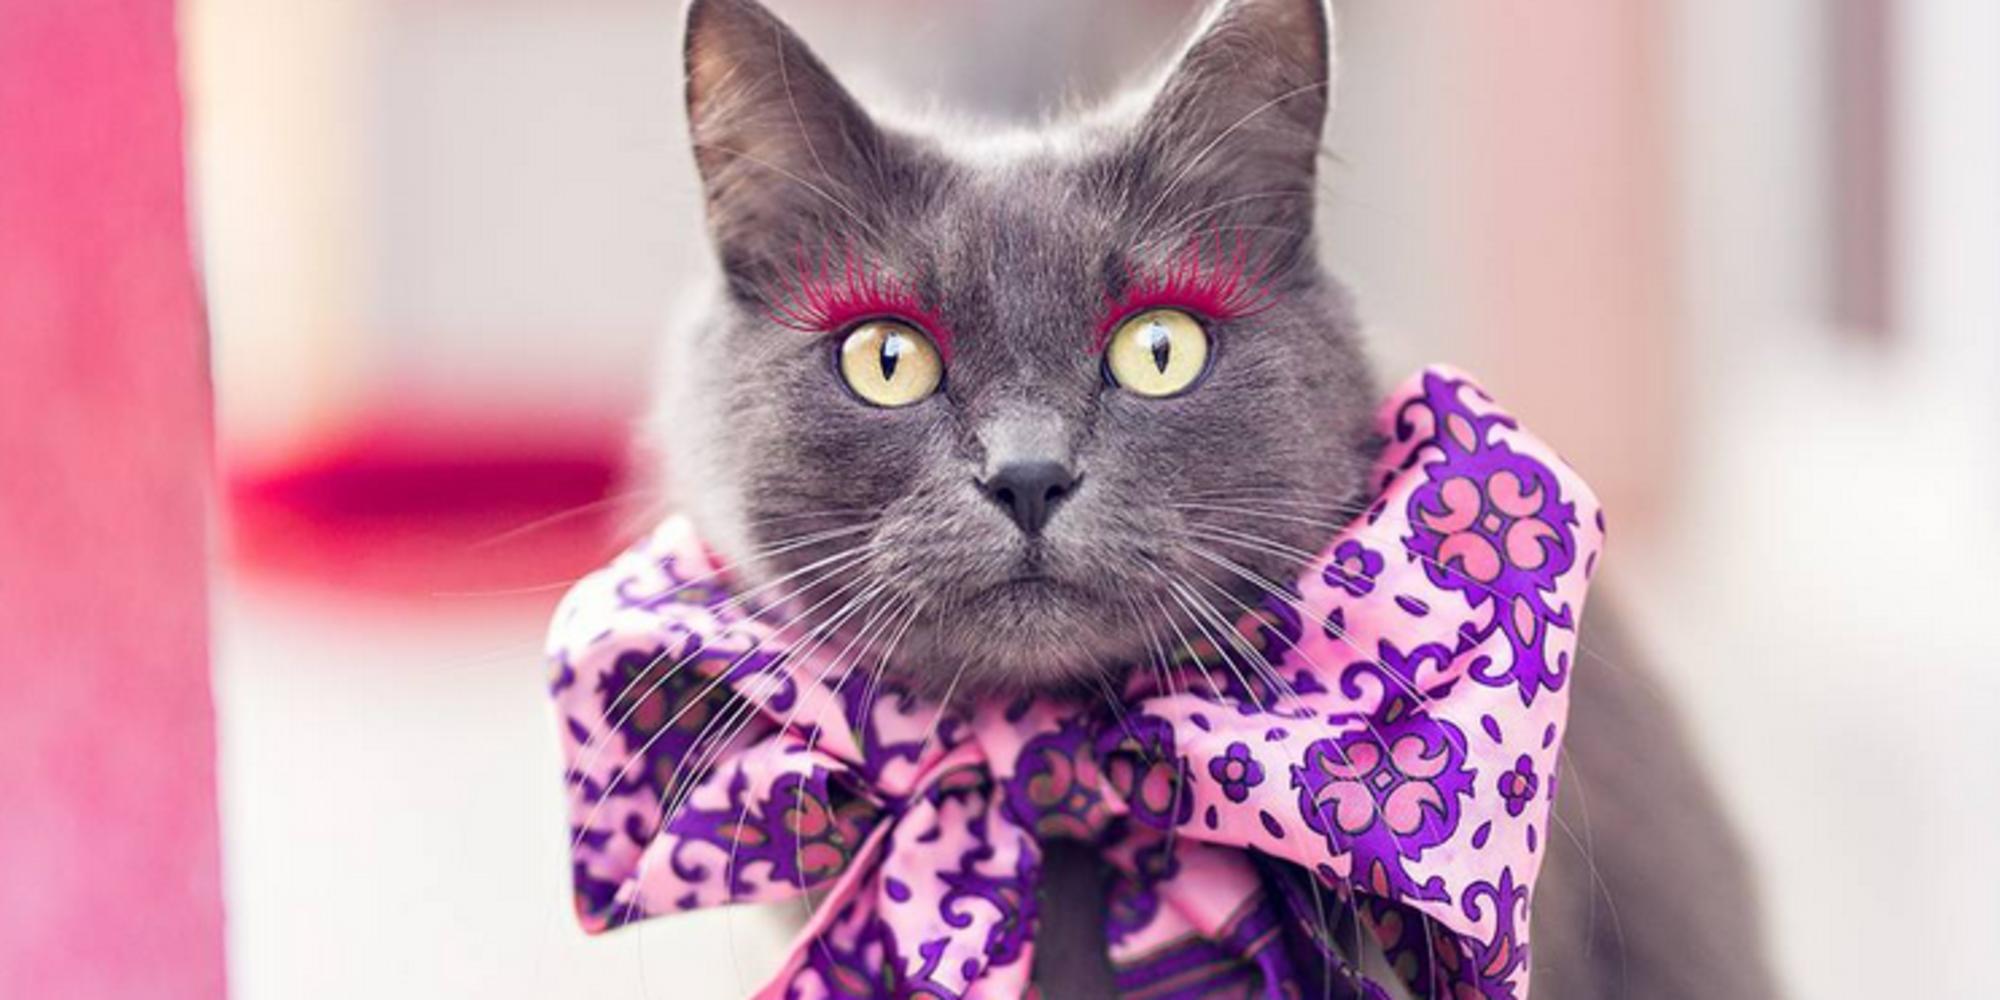 Cat With Fake Eyelashes Instagram Star Beautiful